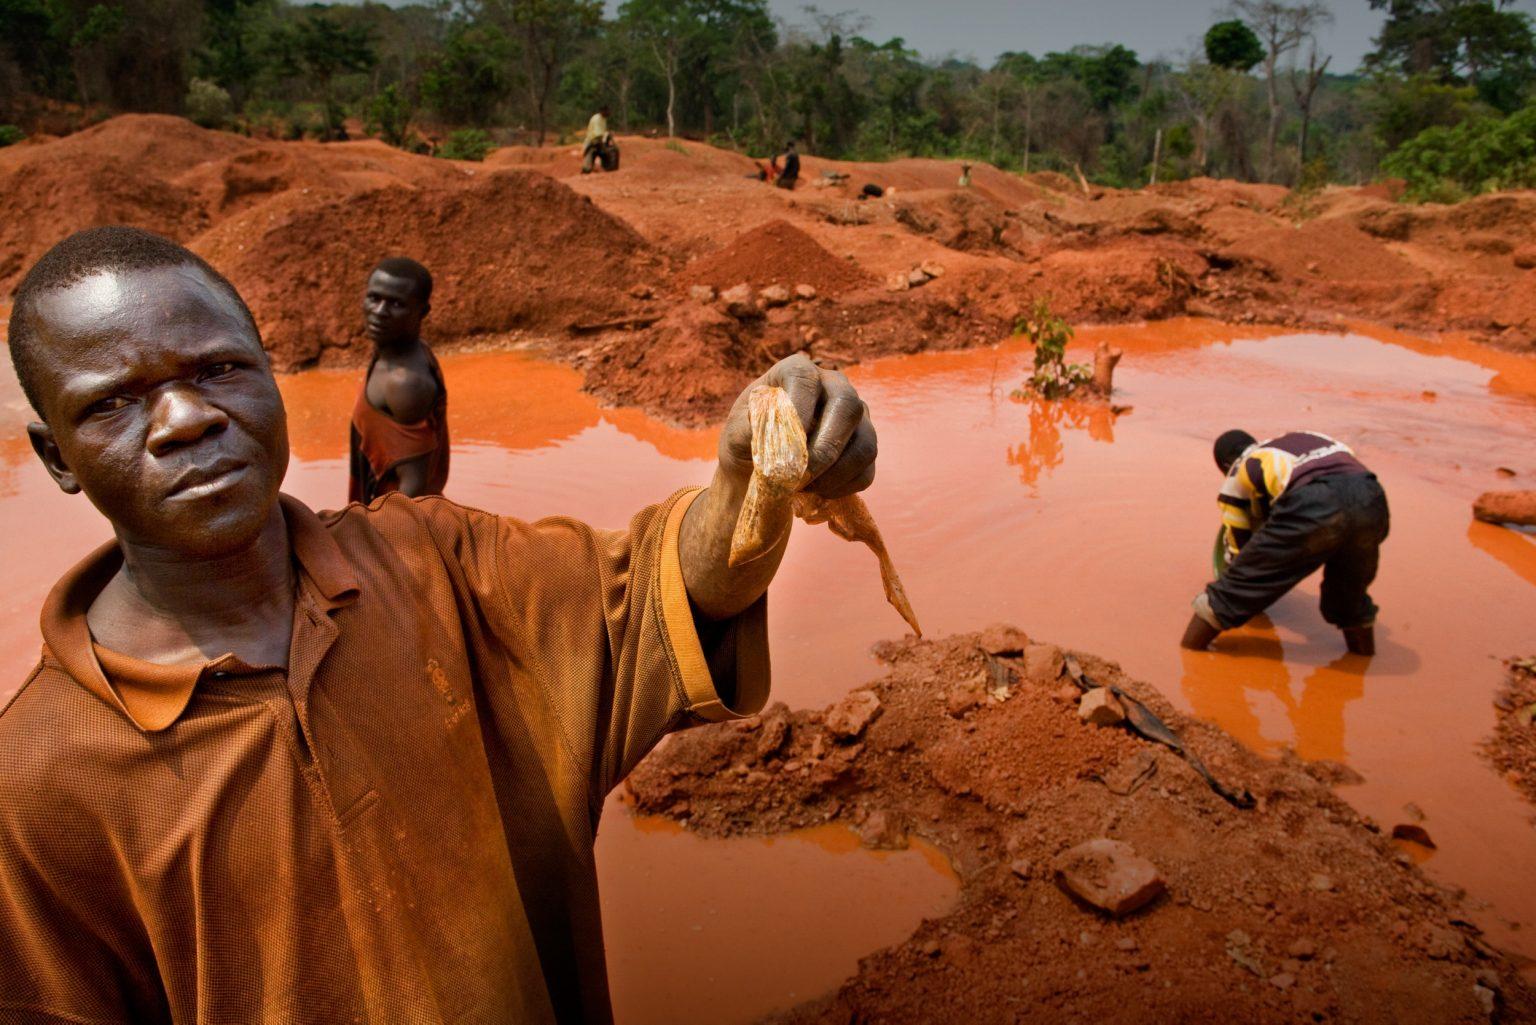 Miner with coltan. Katanga, Carriére Kisengo, Democratic Republic of the Congo, 2008